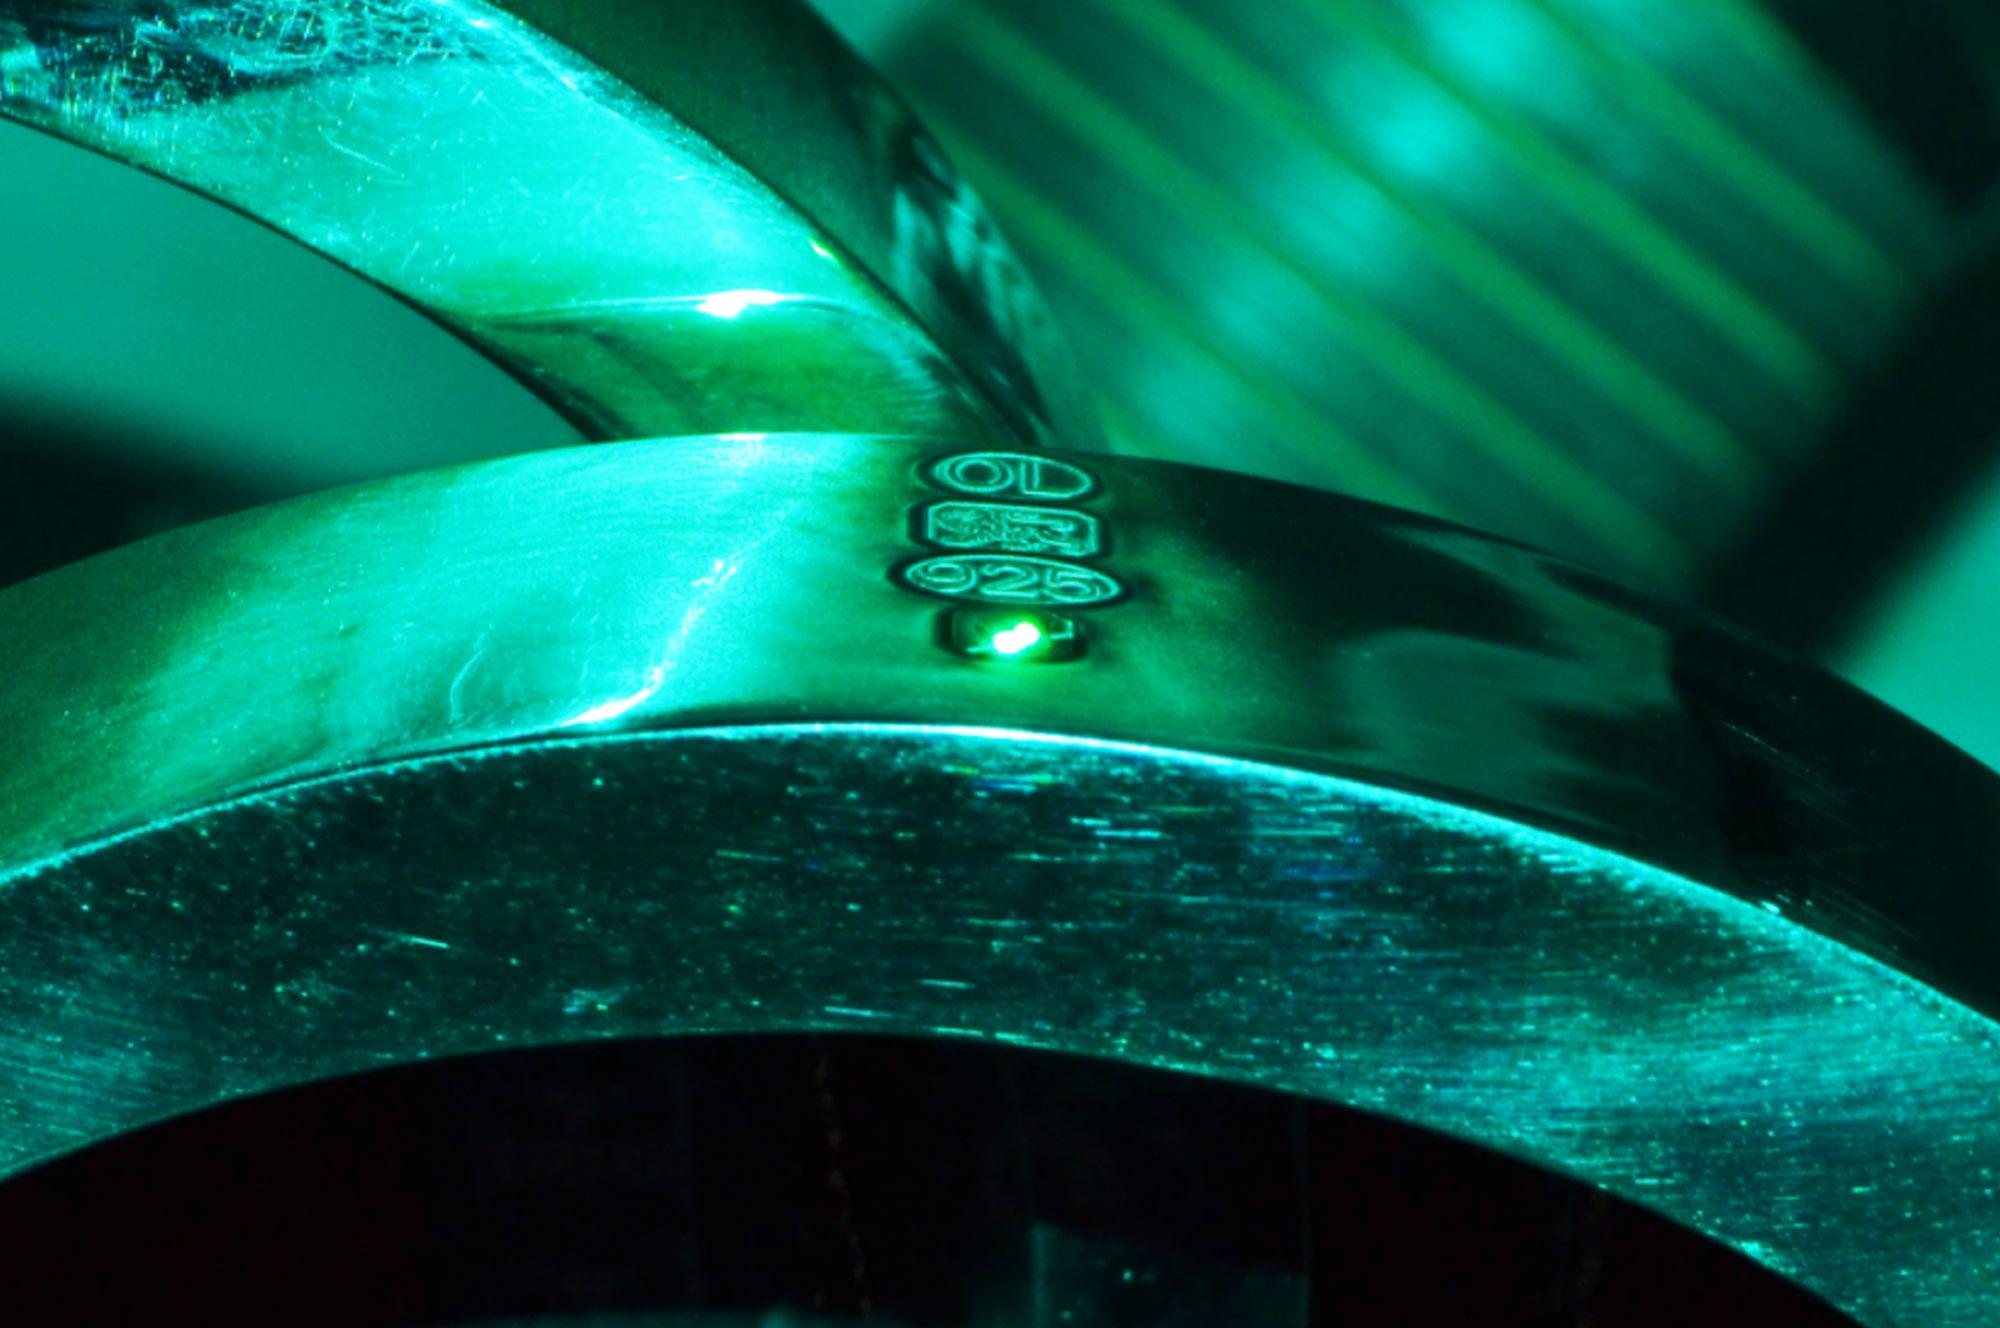 Silver inside laser unit